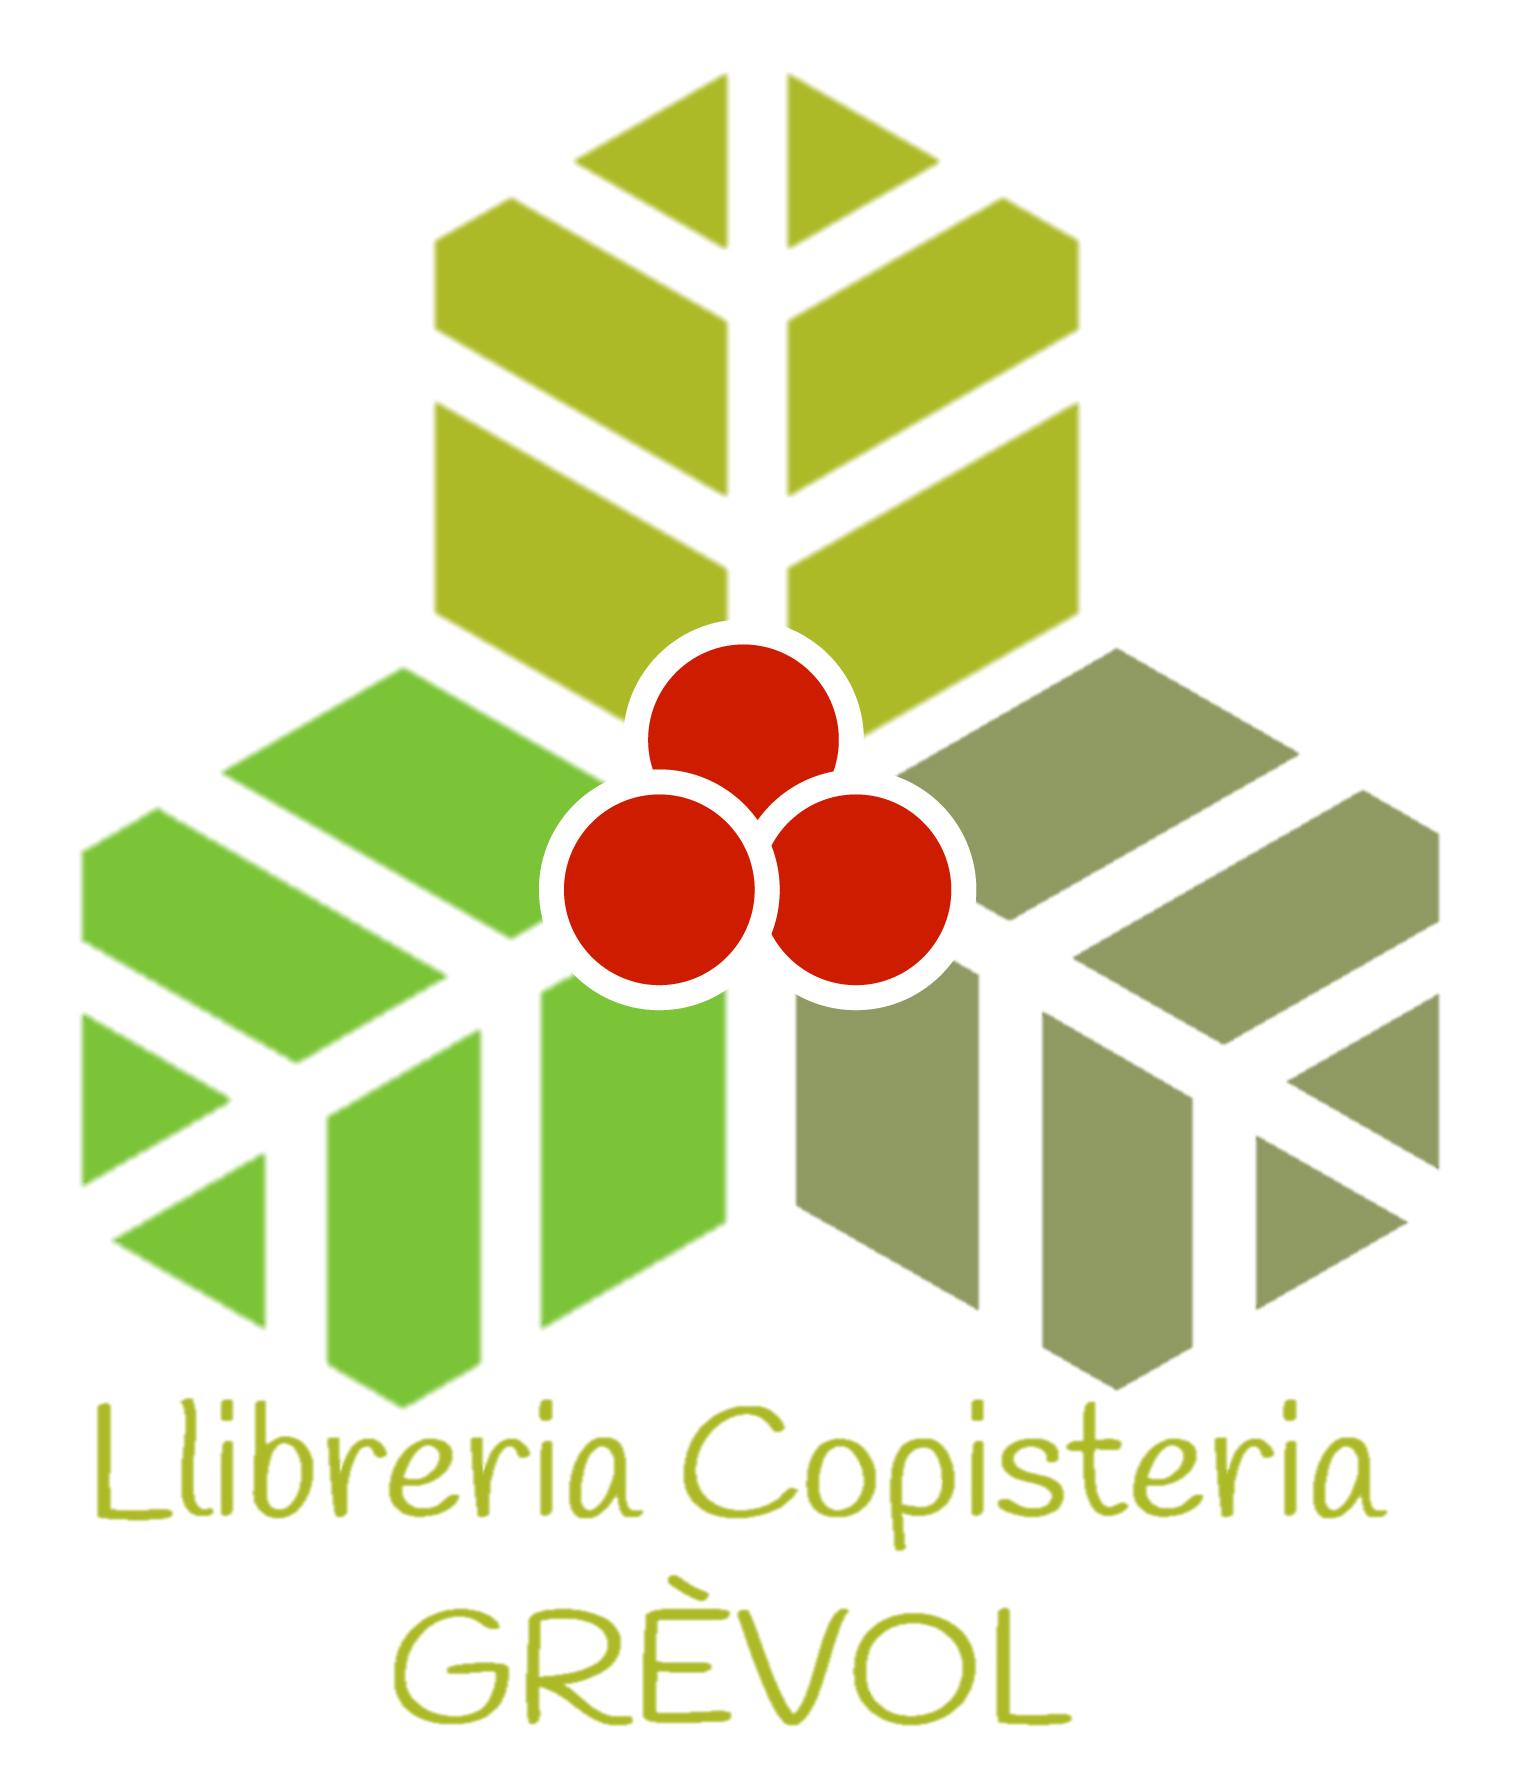 COPISTERIA LLIBRERIA GRÈVOL